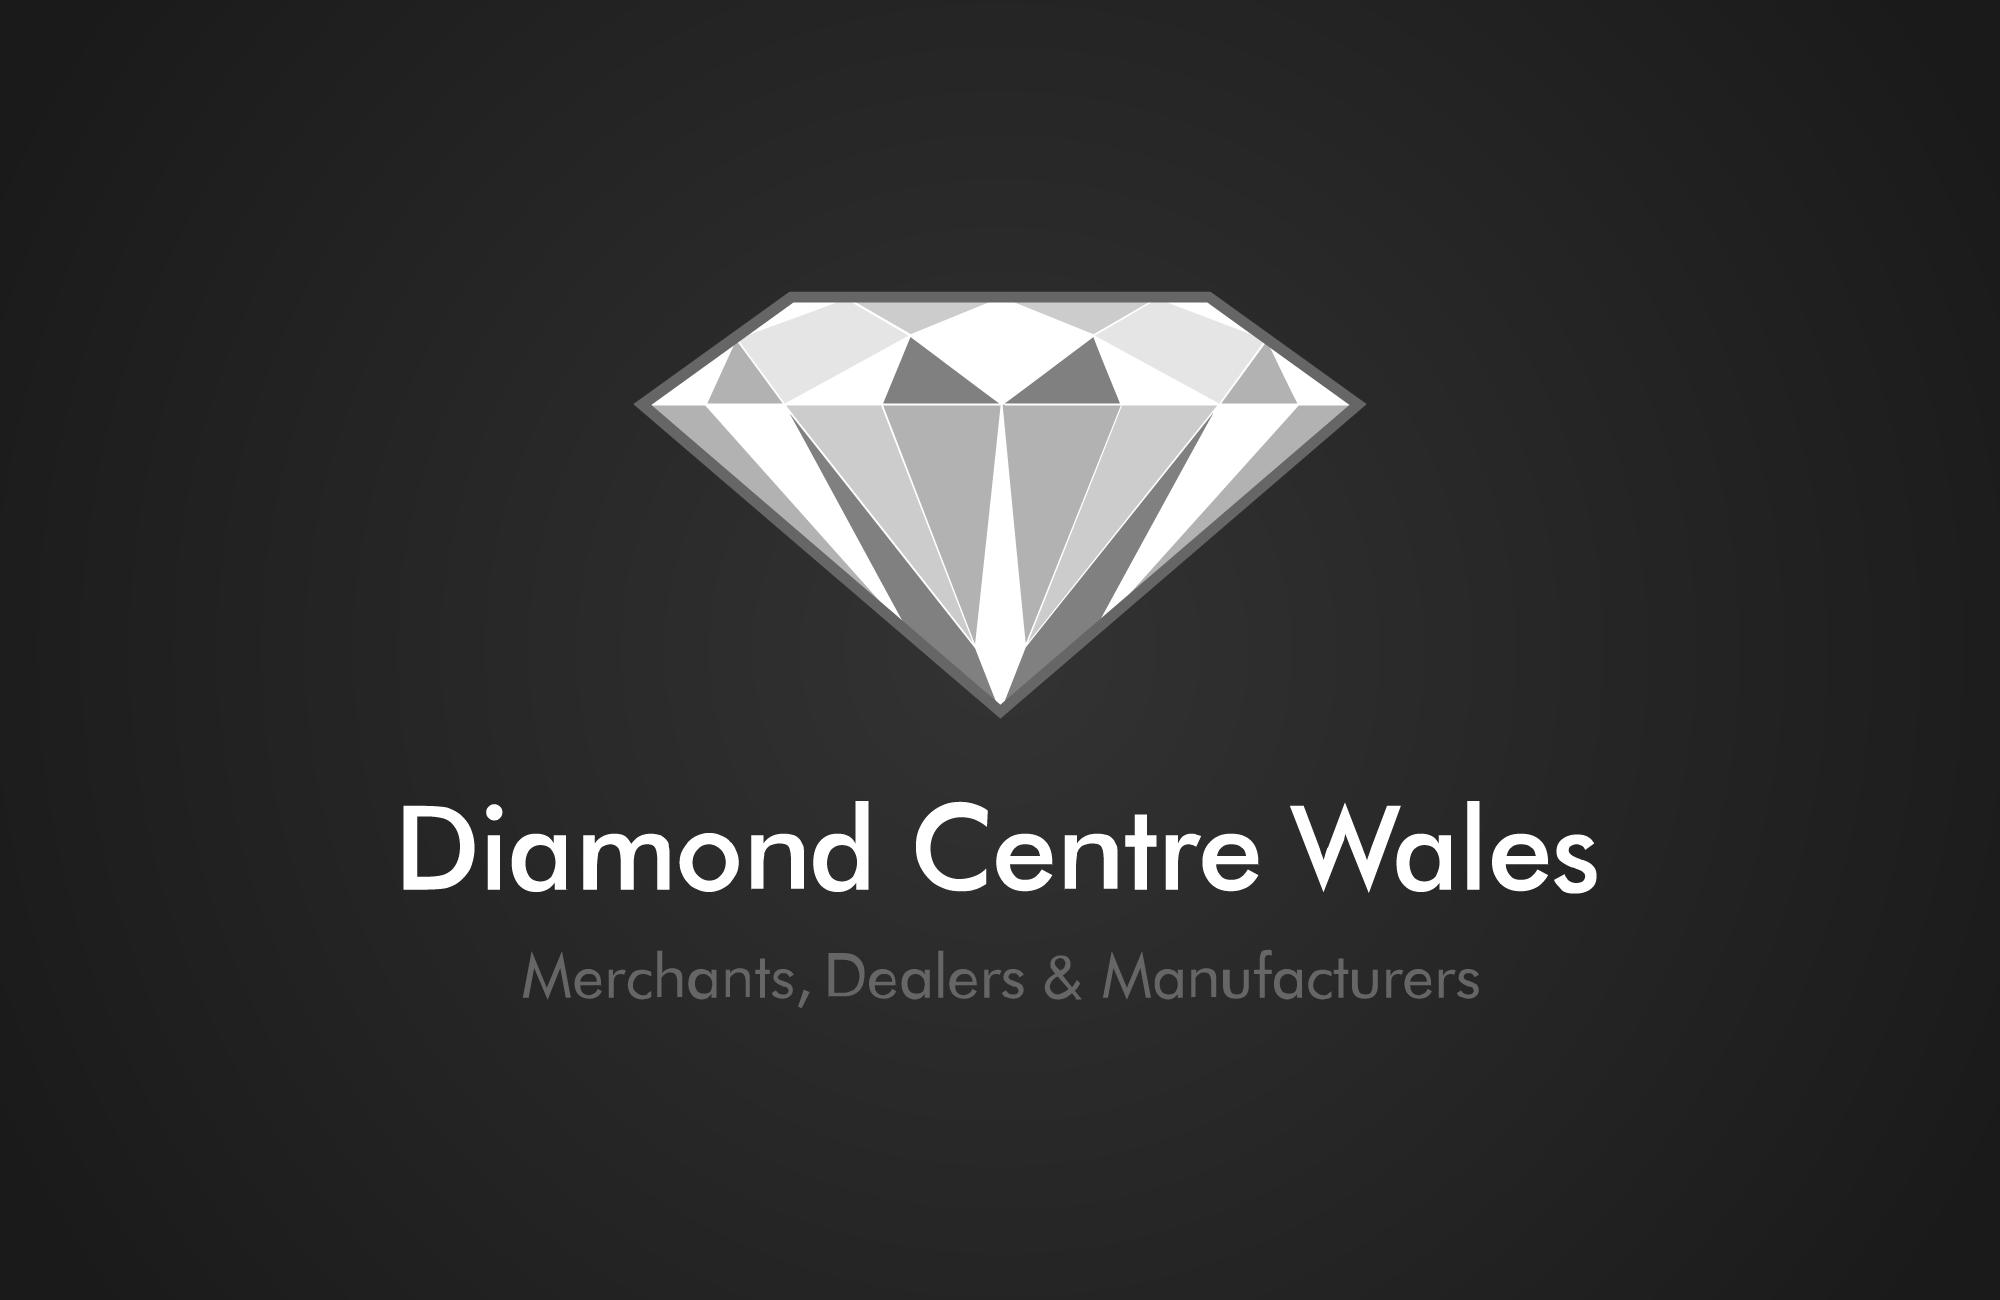 DiamondCentreWales.jpg